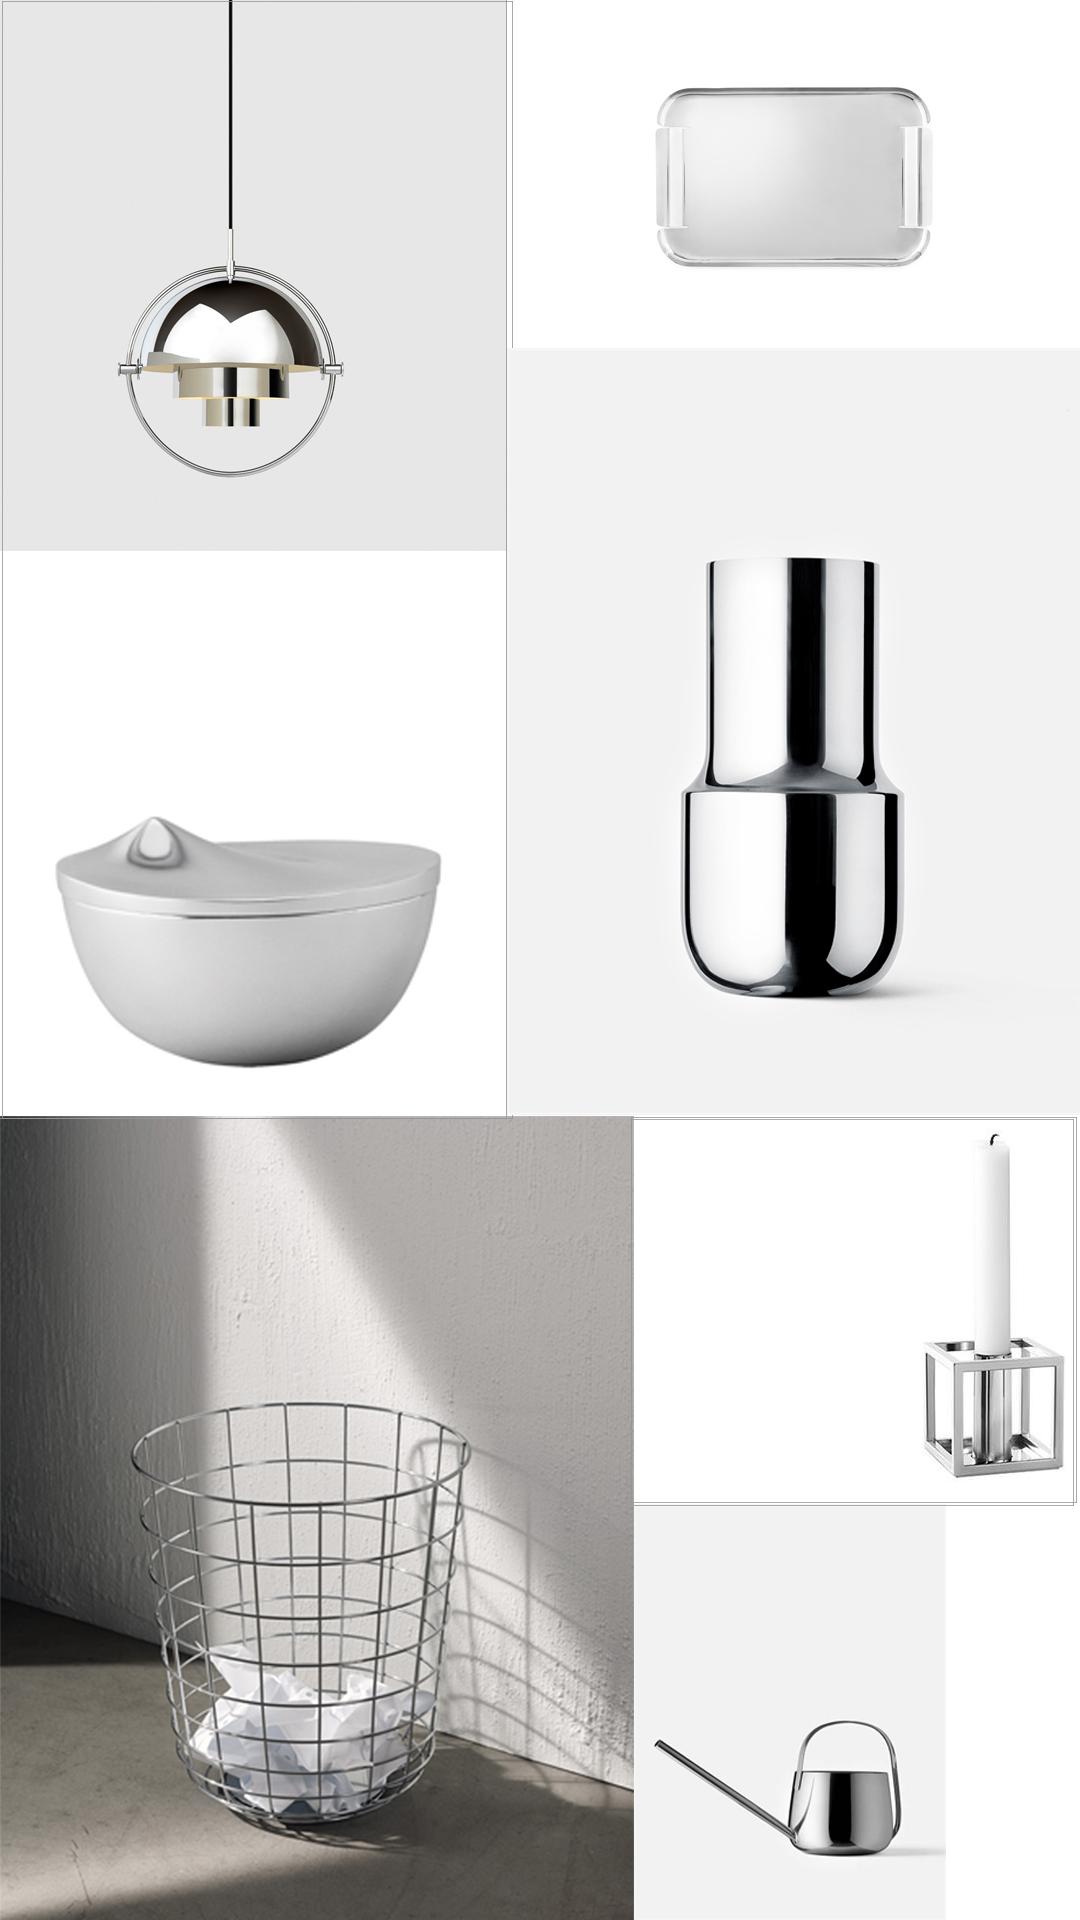 Silver and chrome Scandinavian design accessories